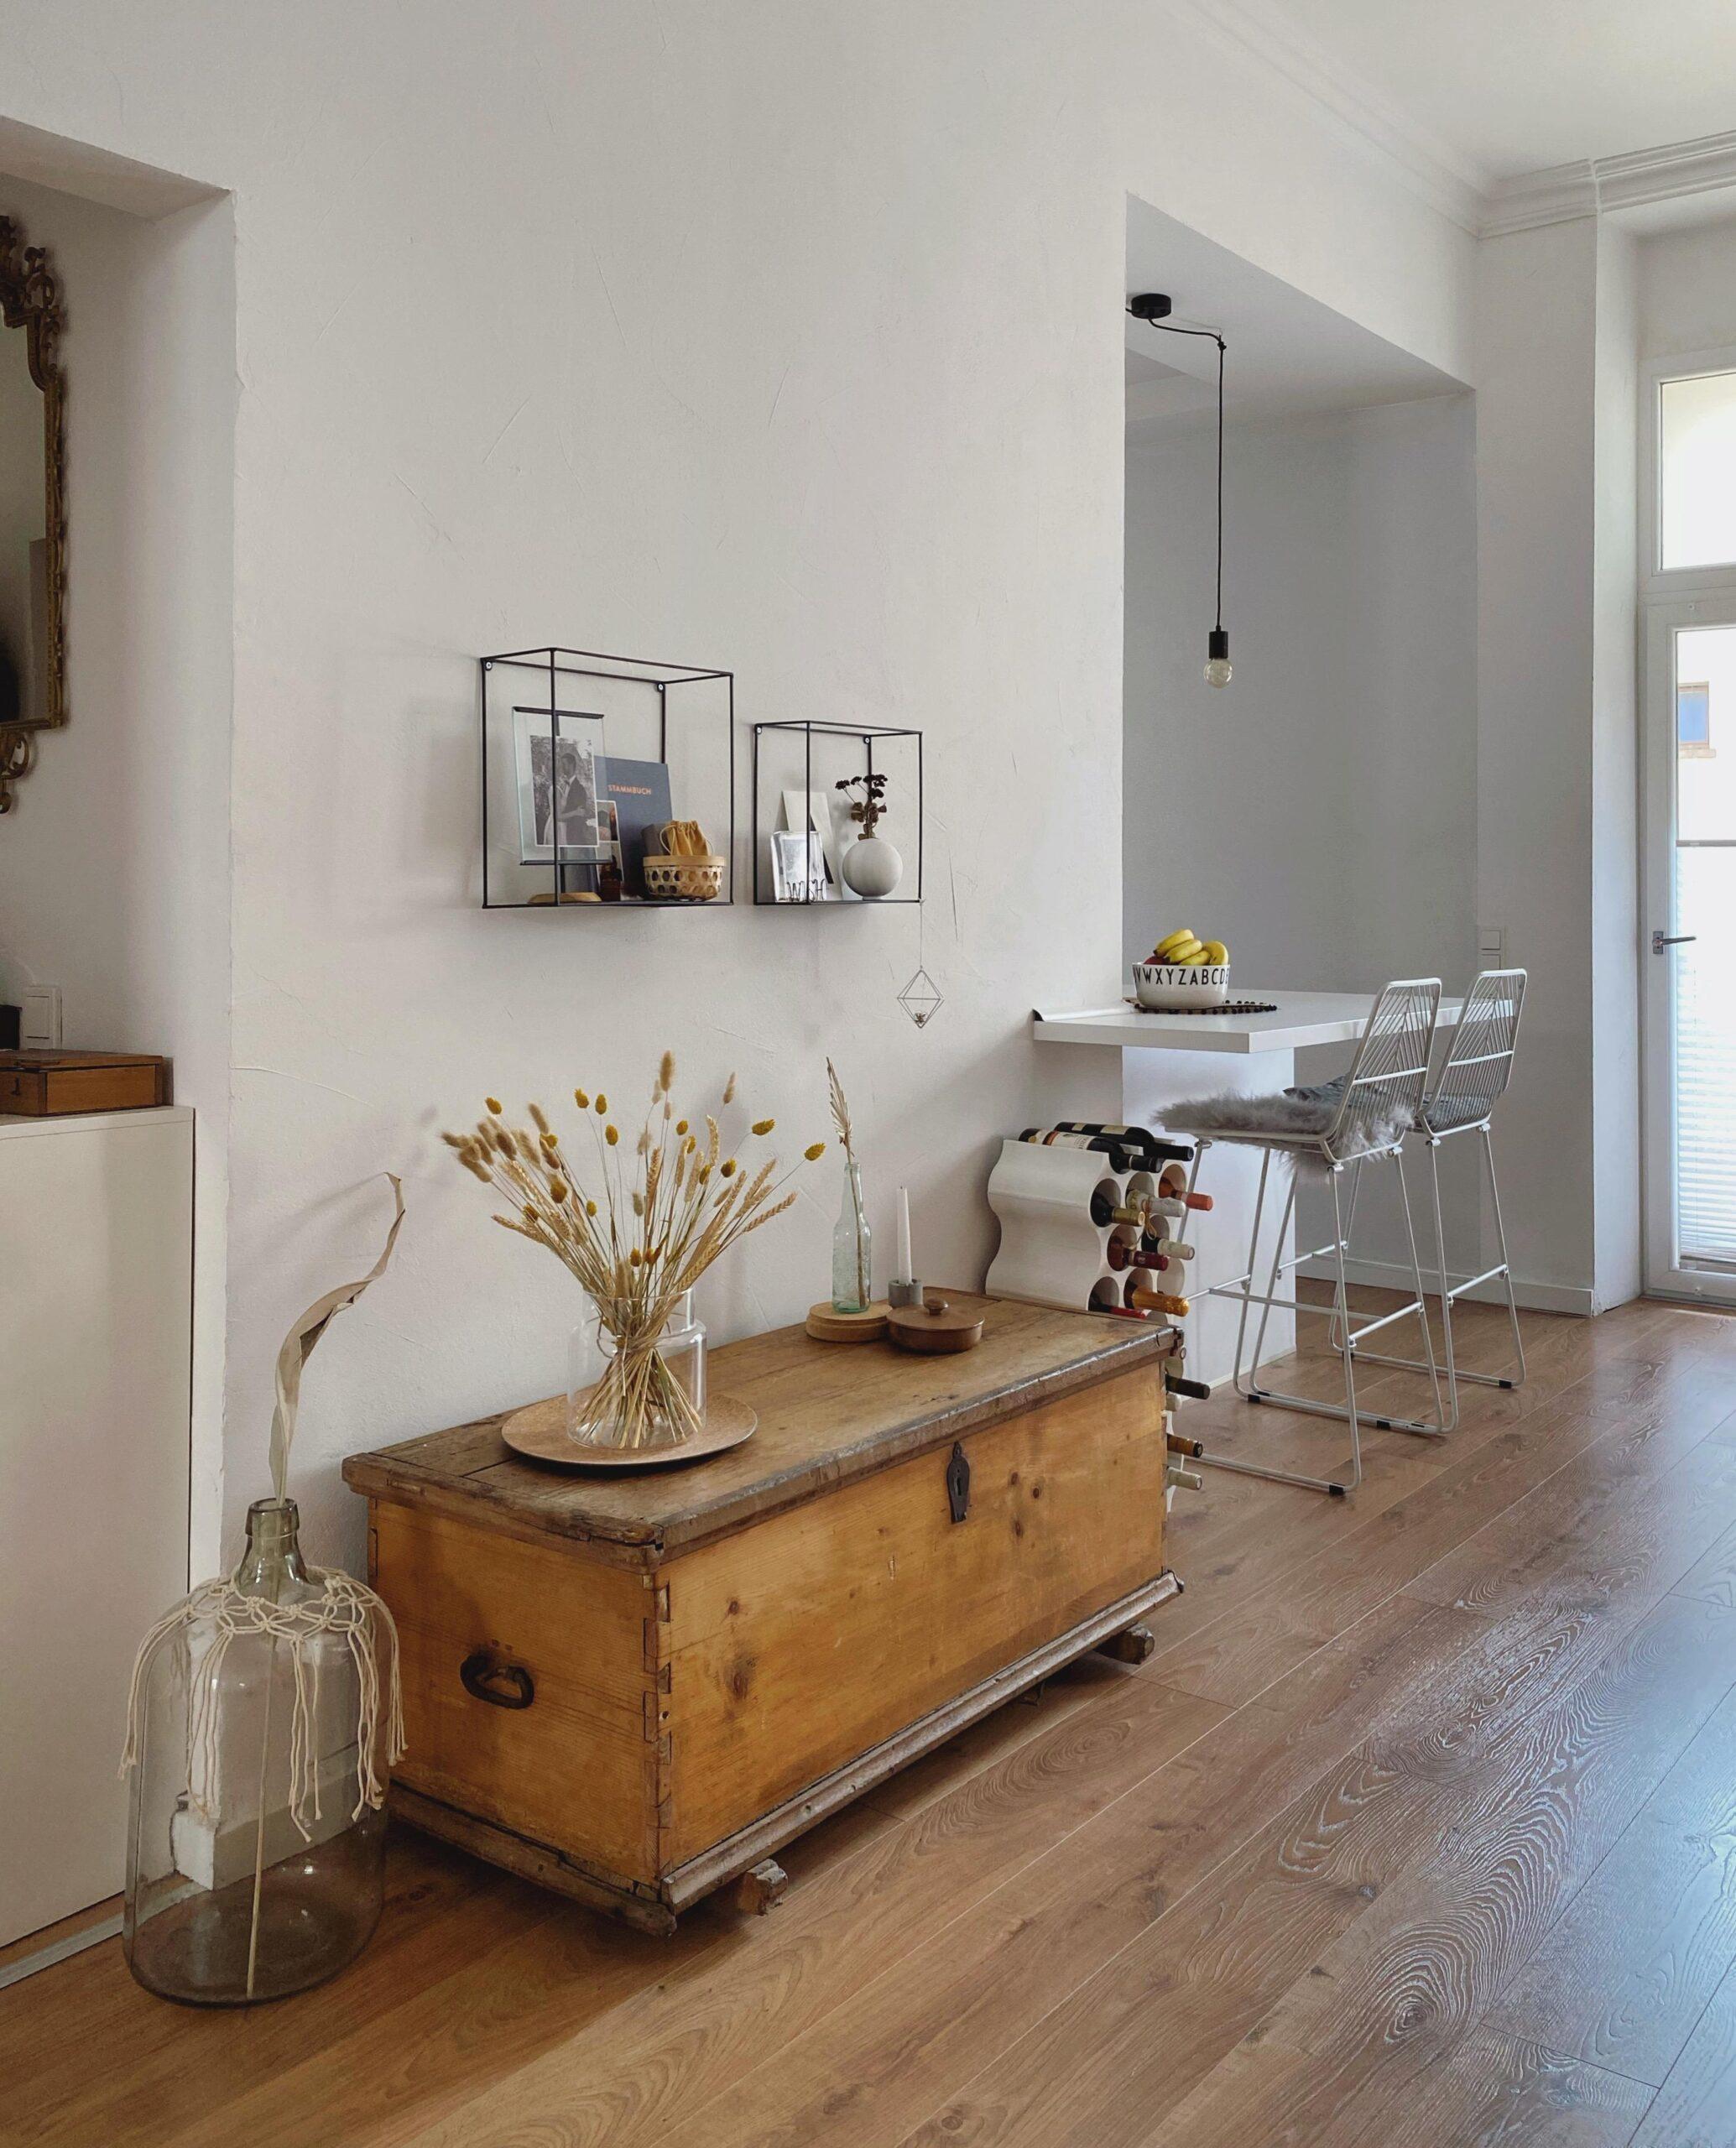 Full Size of Rattanbett Ikea Holztruhe Bilder Ideen Couch Sofa Mit Schlaffunktion Küche Kosten Modulküche Betten 160x200 Bei Miniküche Kaufen Wohnzimmer Rattanbett Ikea